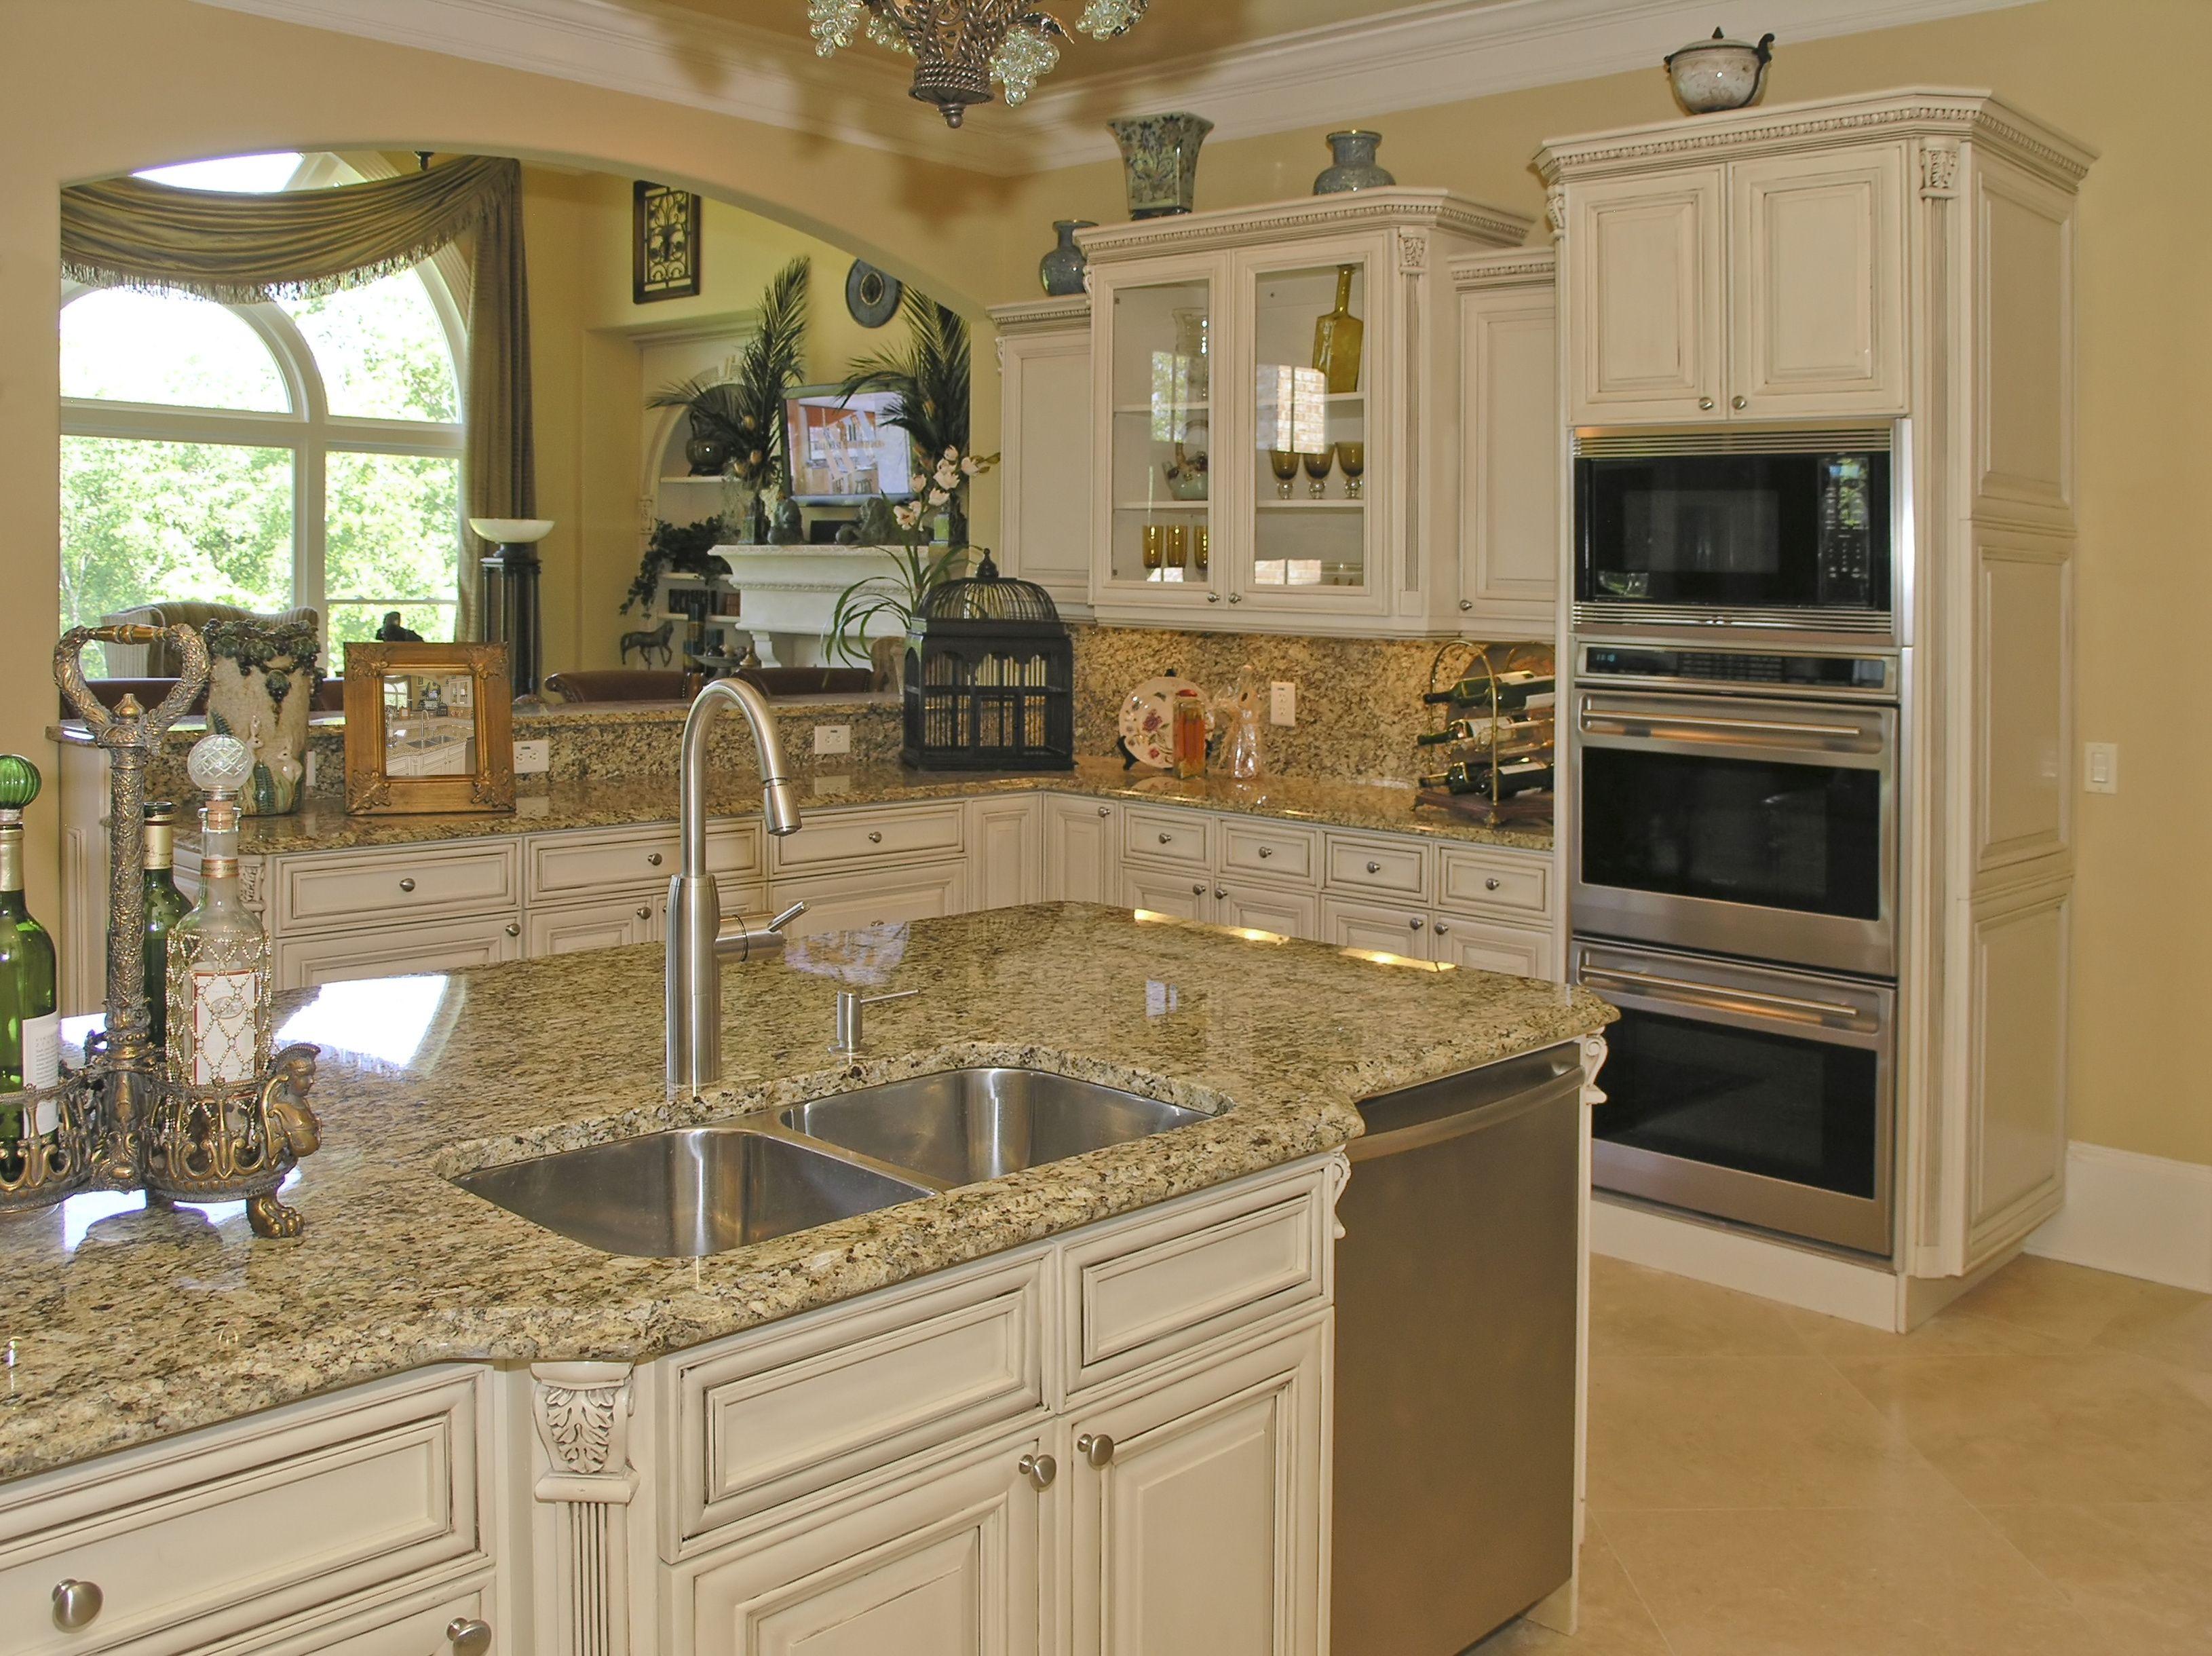 Antique White Kitchen Cabinets Kitchen Country Kitchen Designs With Marble Antique White Kitchen Cabinets Antique White Kitchen Custom Kitchen Cabinets Design